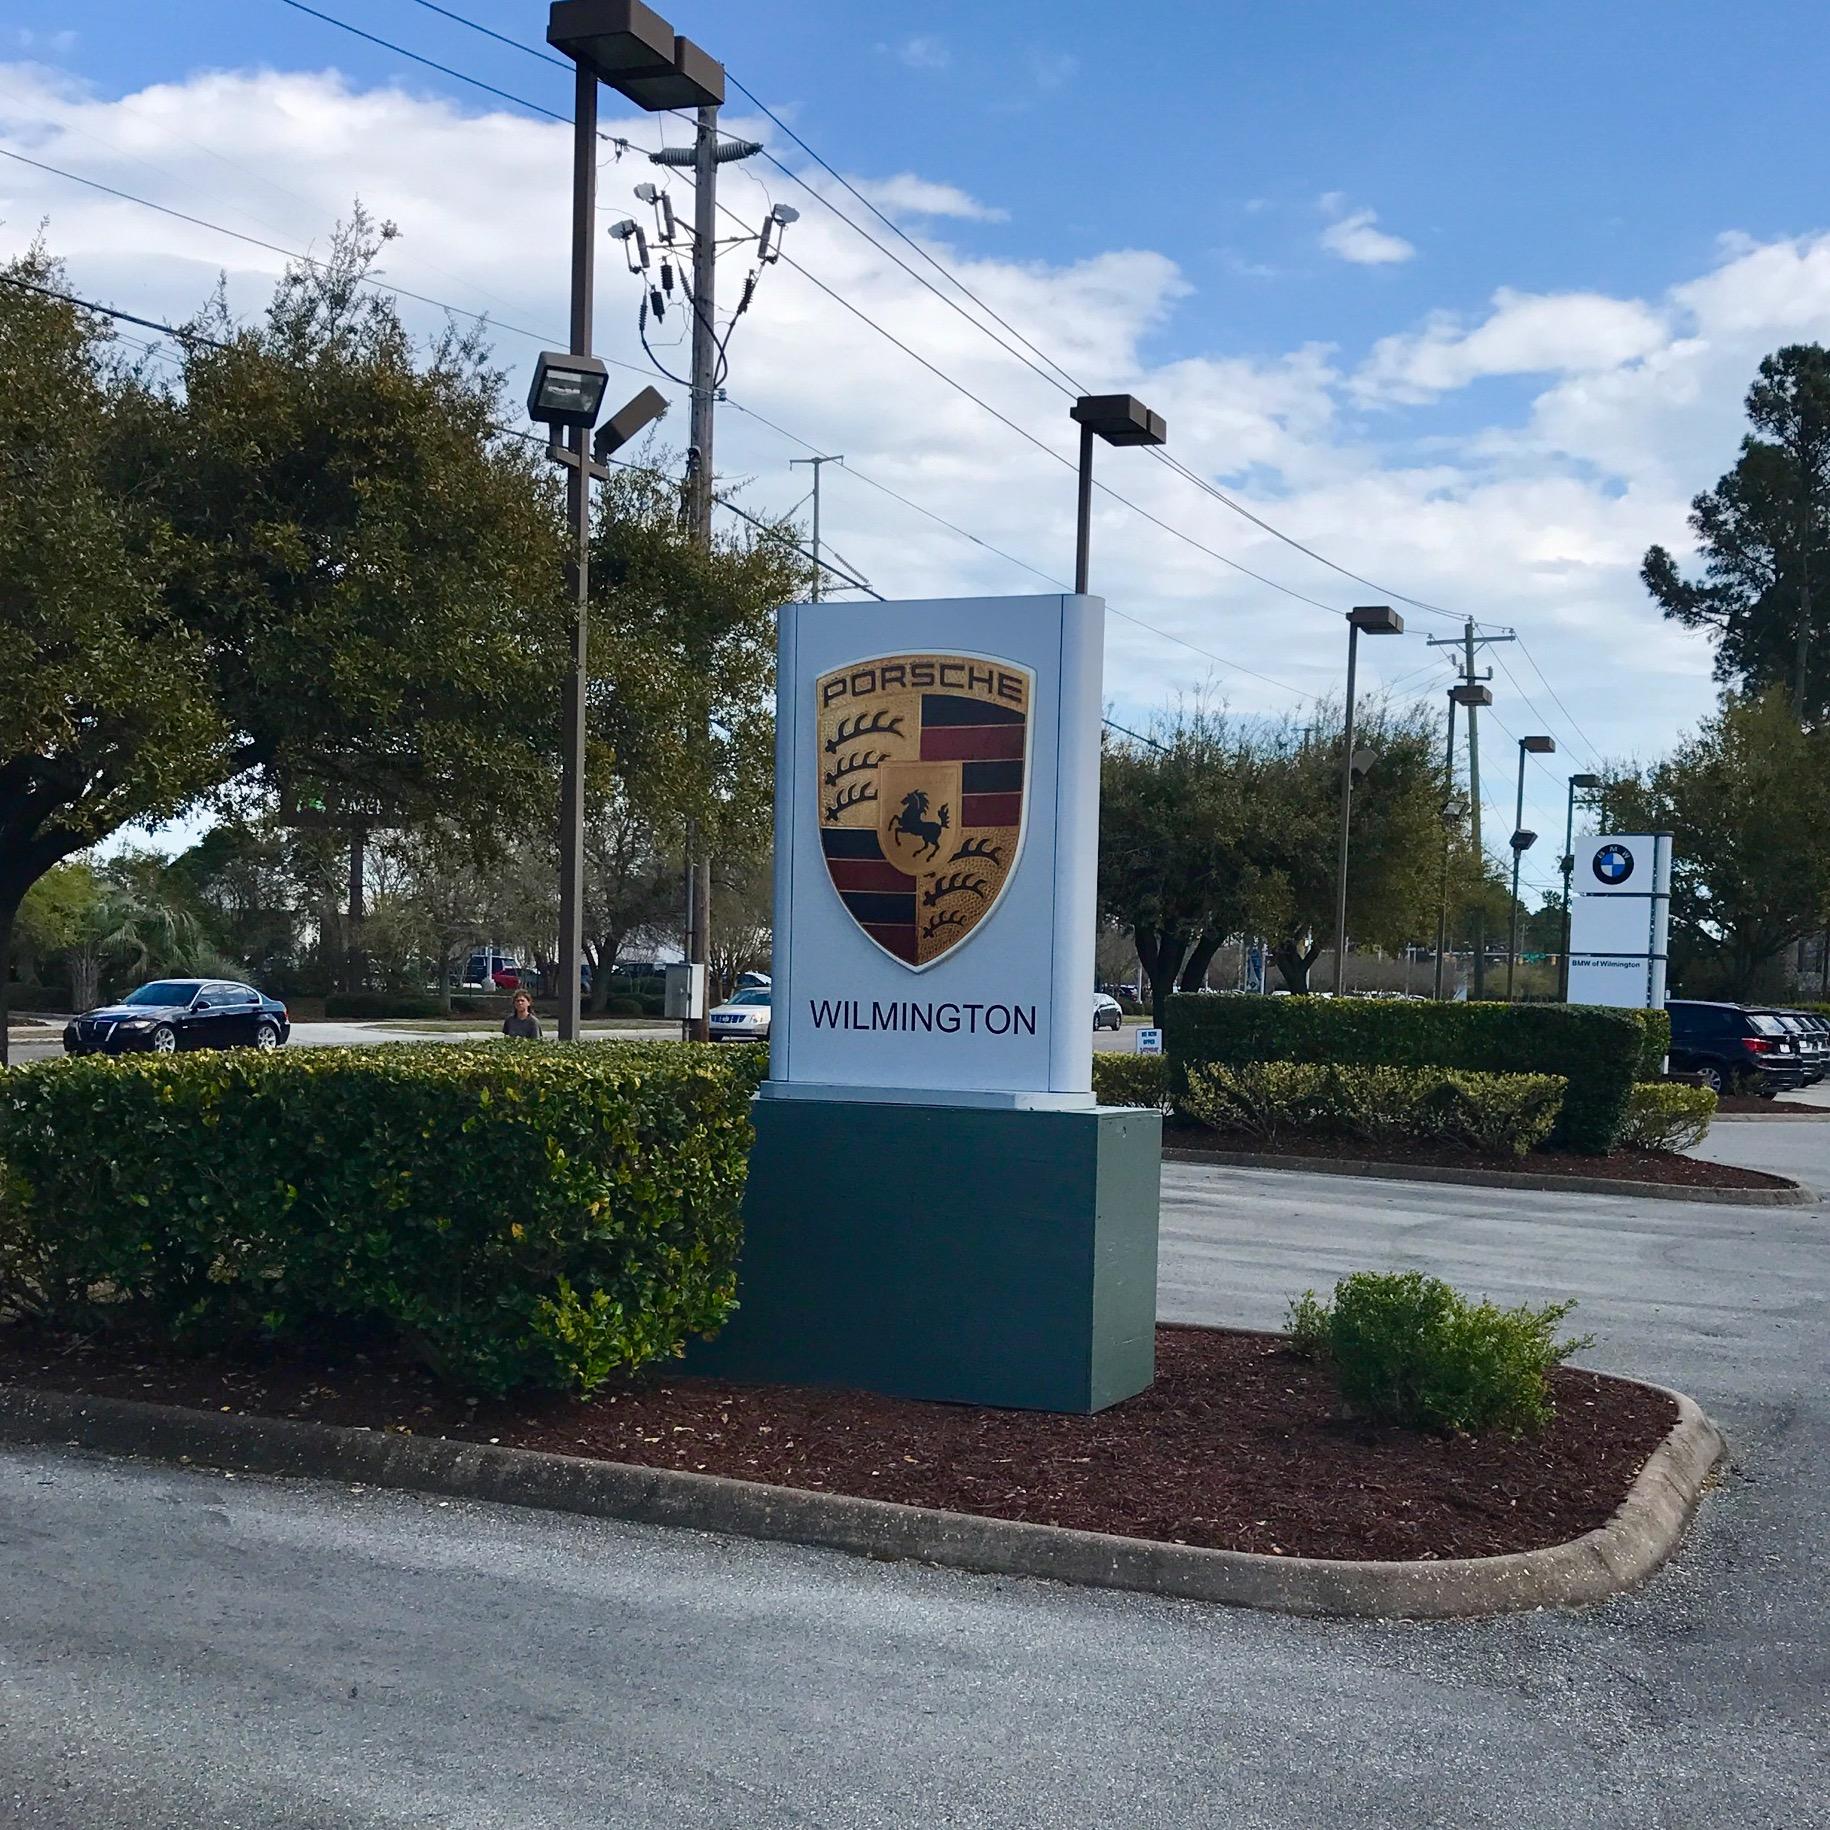 Porsche Wilmington Joins the Baker Motor pany Family